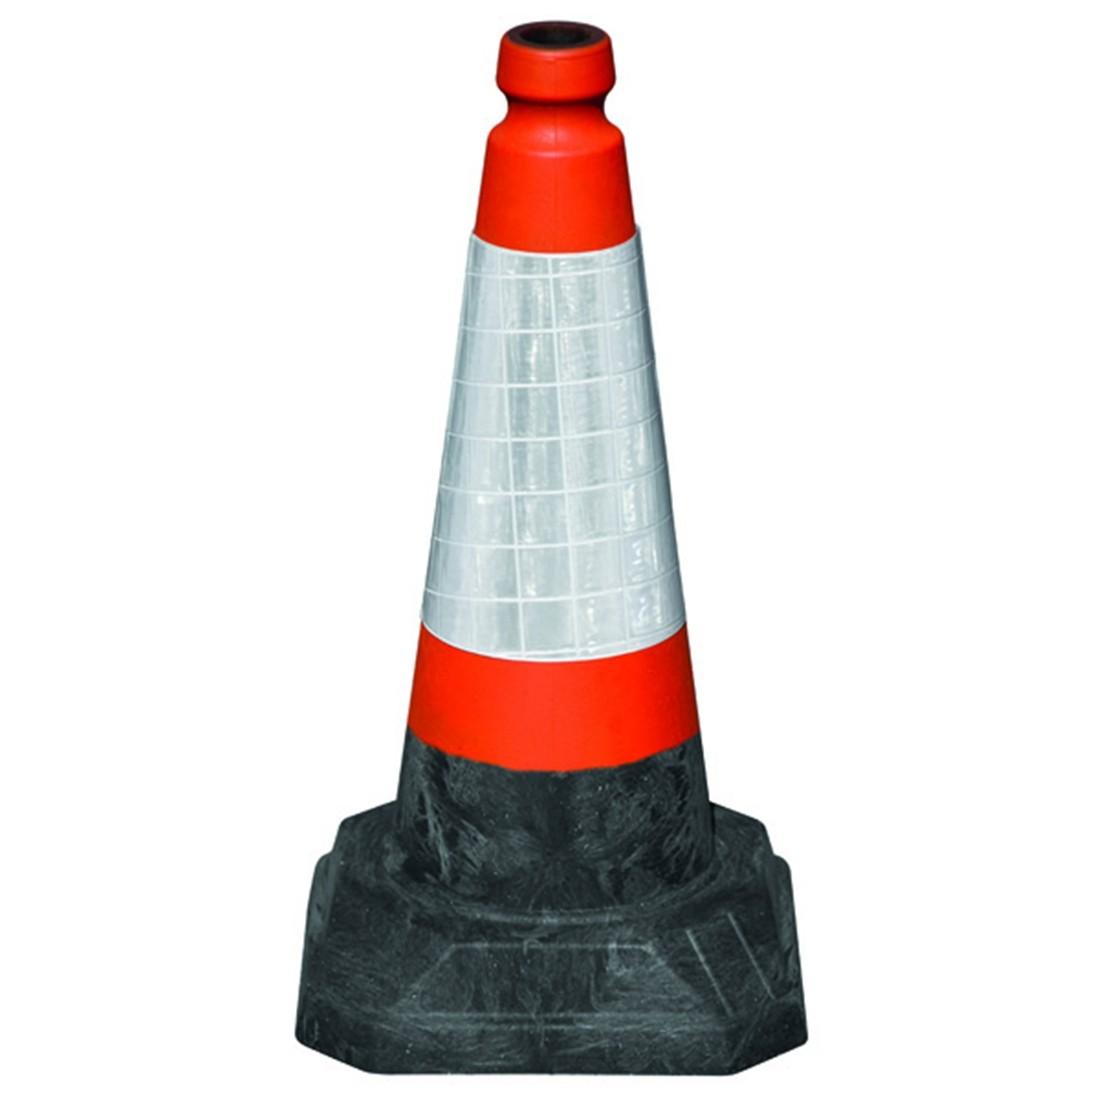 RoadHog Road Cone / Traffic Cone 1 part - 500mm